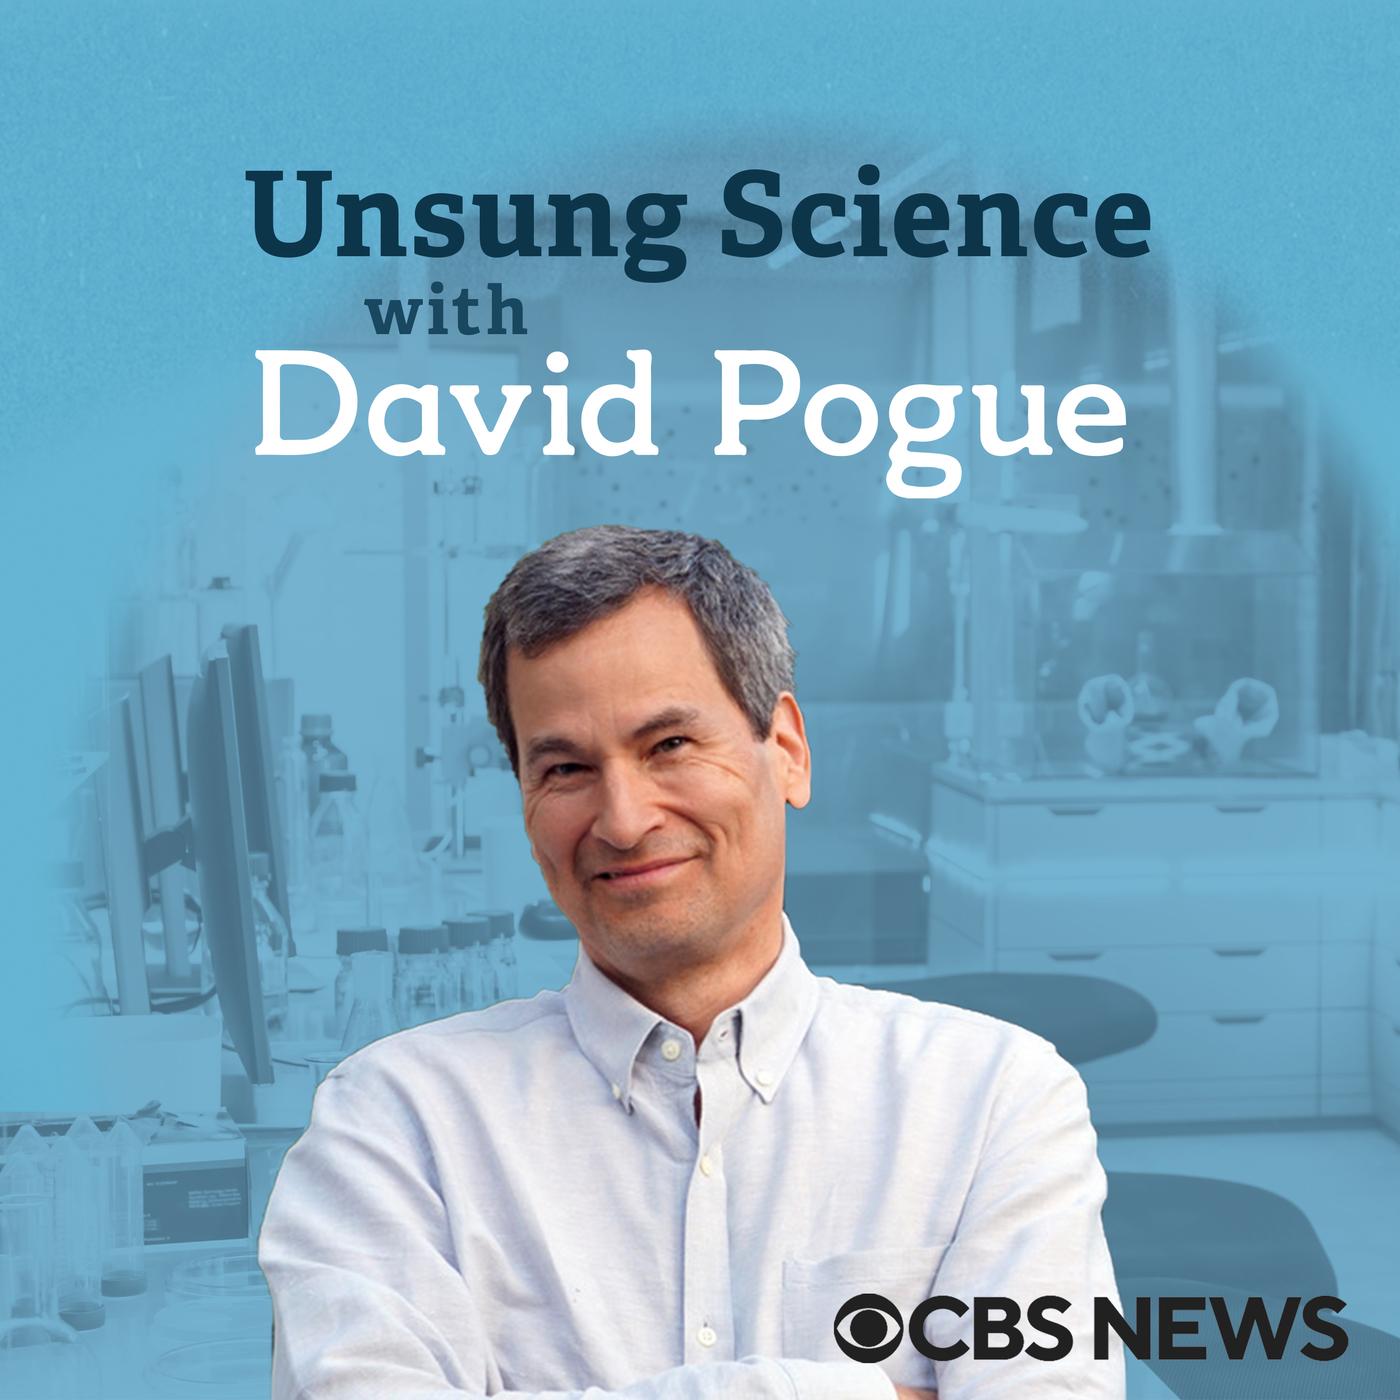 UNSUNG SCIENCE WITH DAVID POGUE